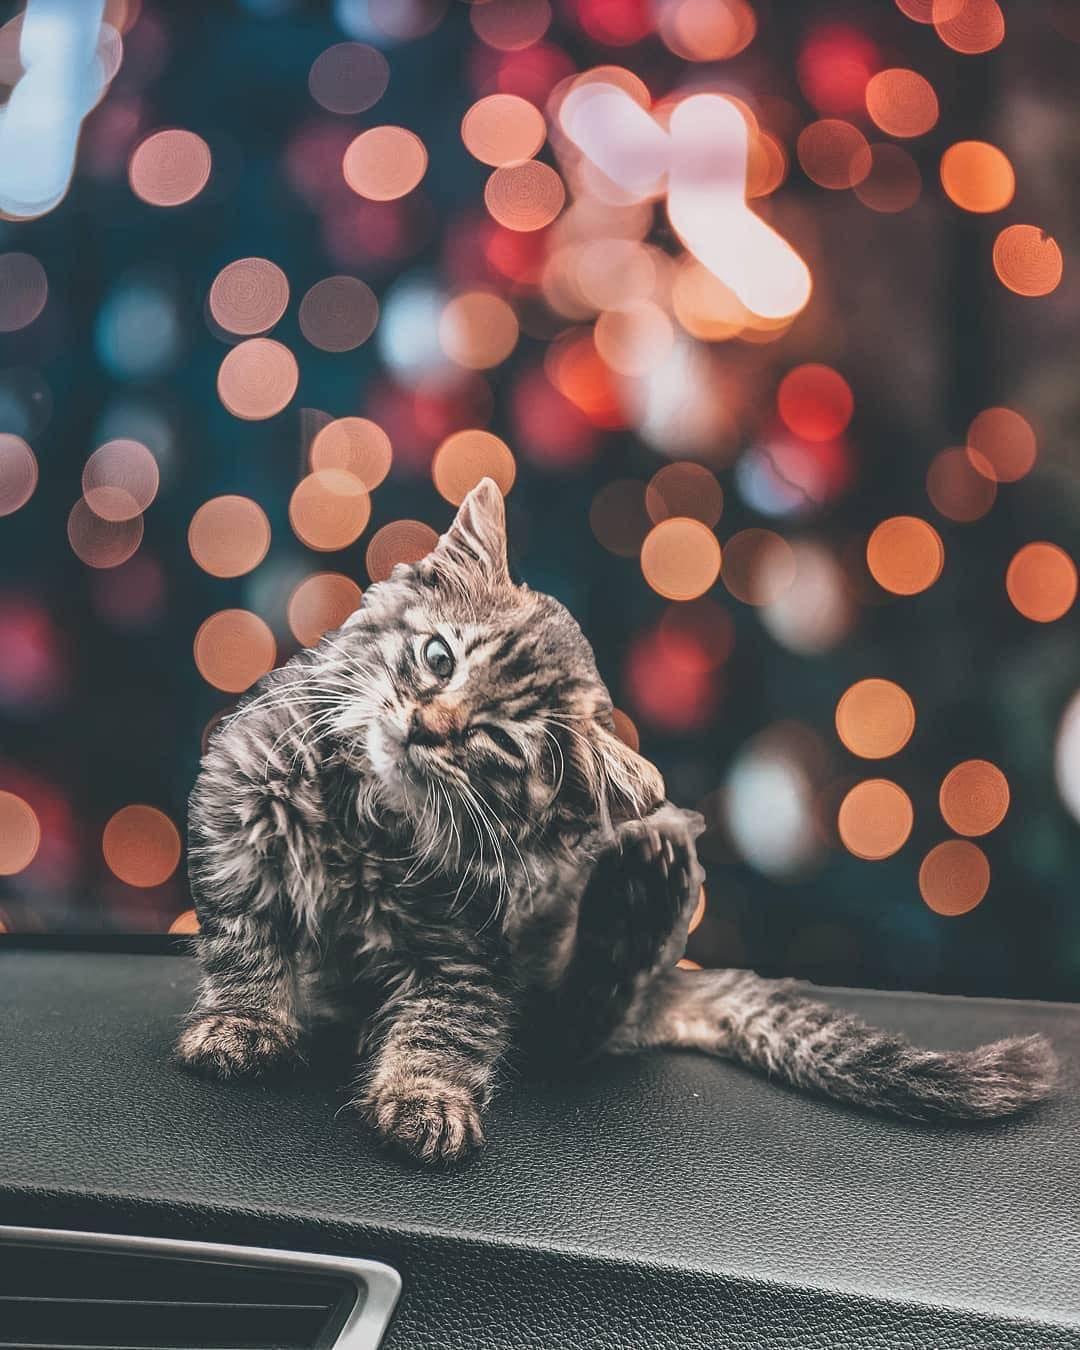 Bokeh Kitten 30 9k Likes 345 Comments Visual Ambassadors Visualambassadors On Instagram To Photography Guidelines World Photography Bokeh Photography